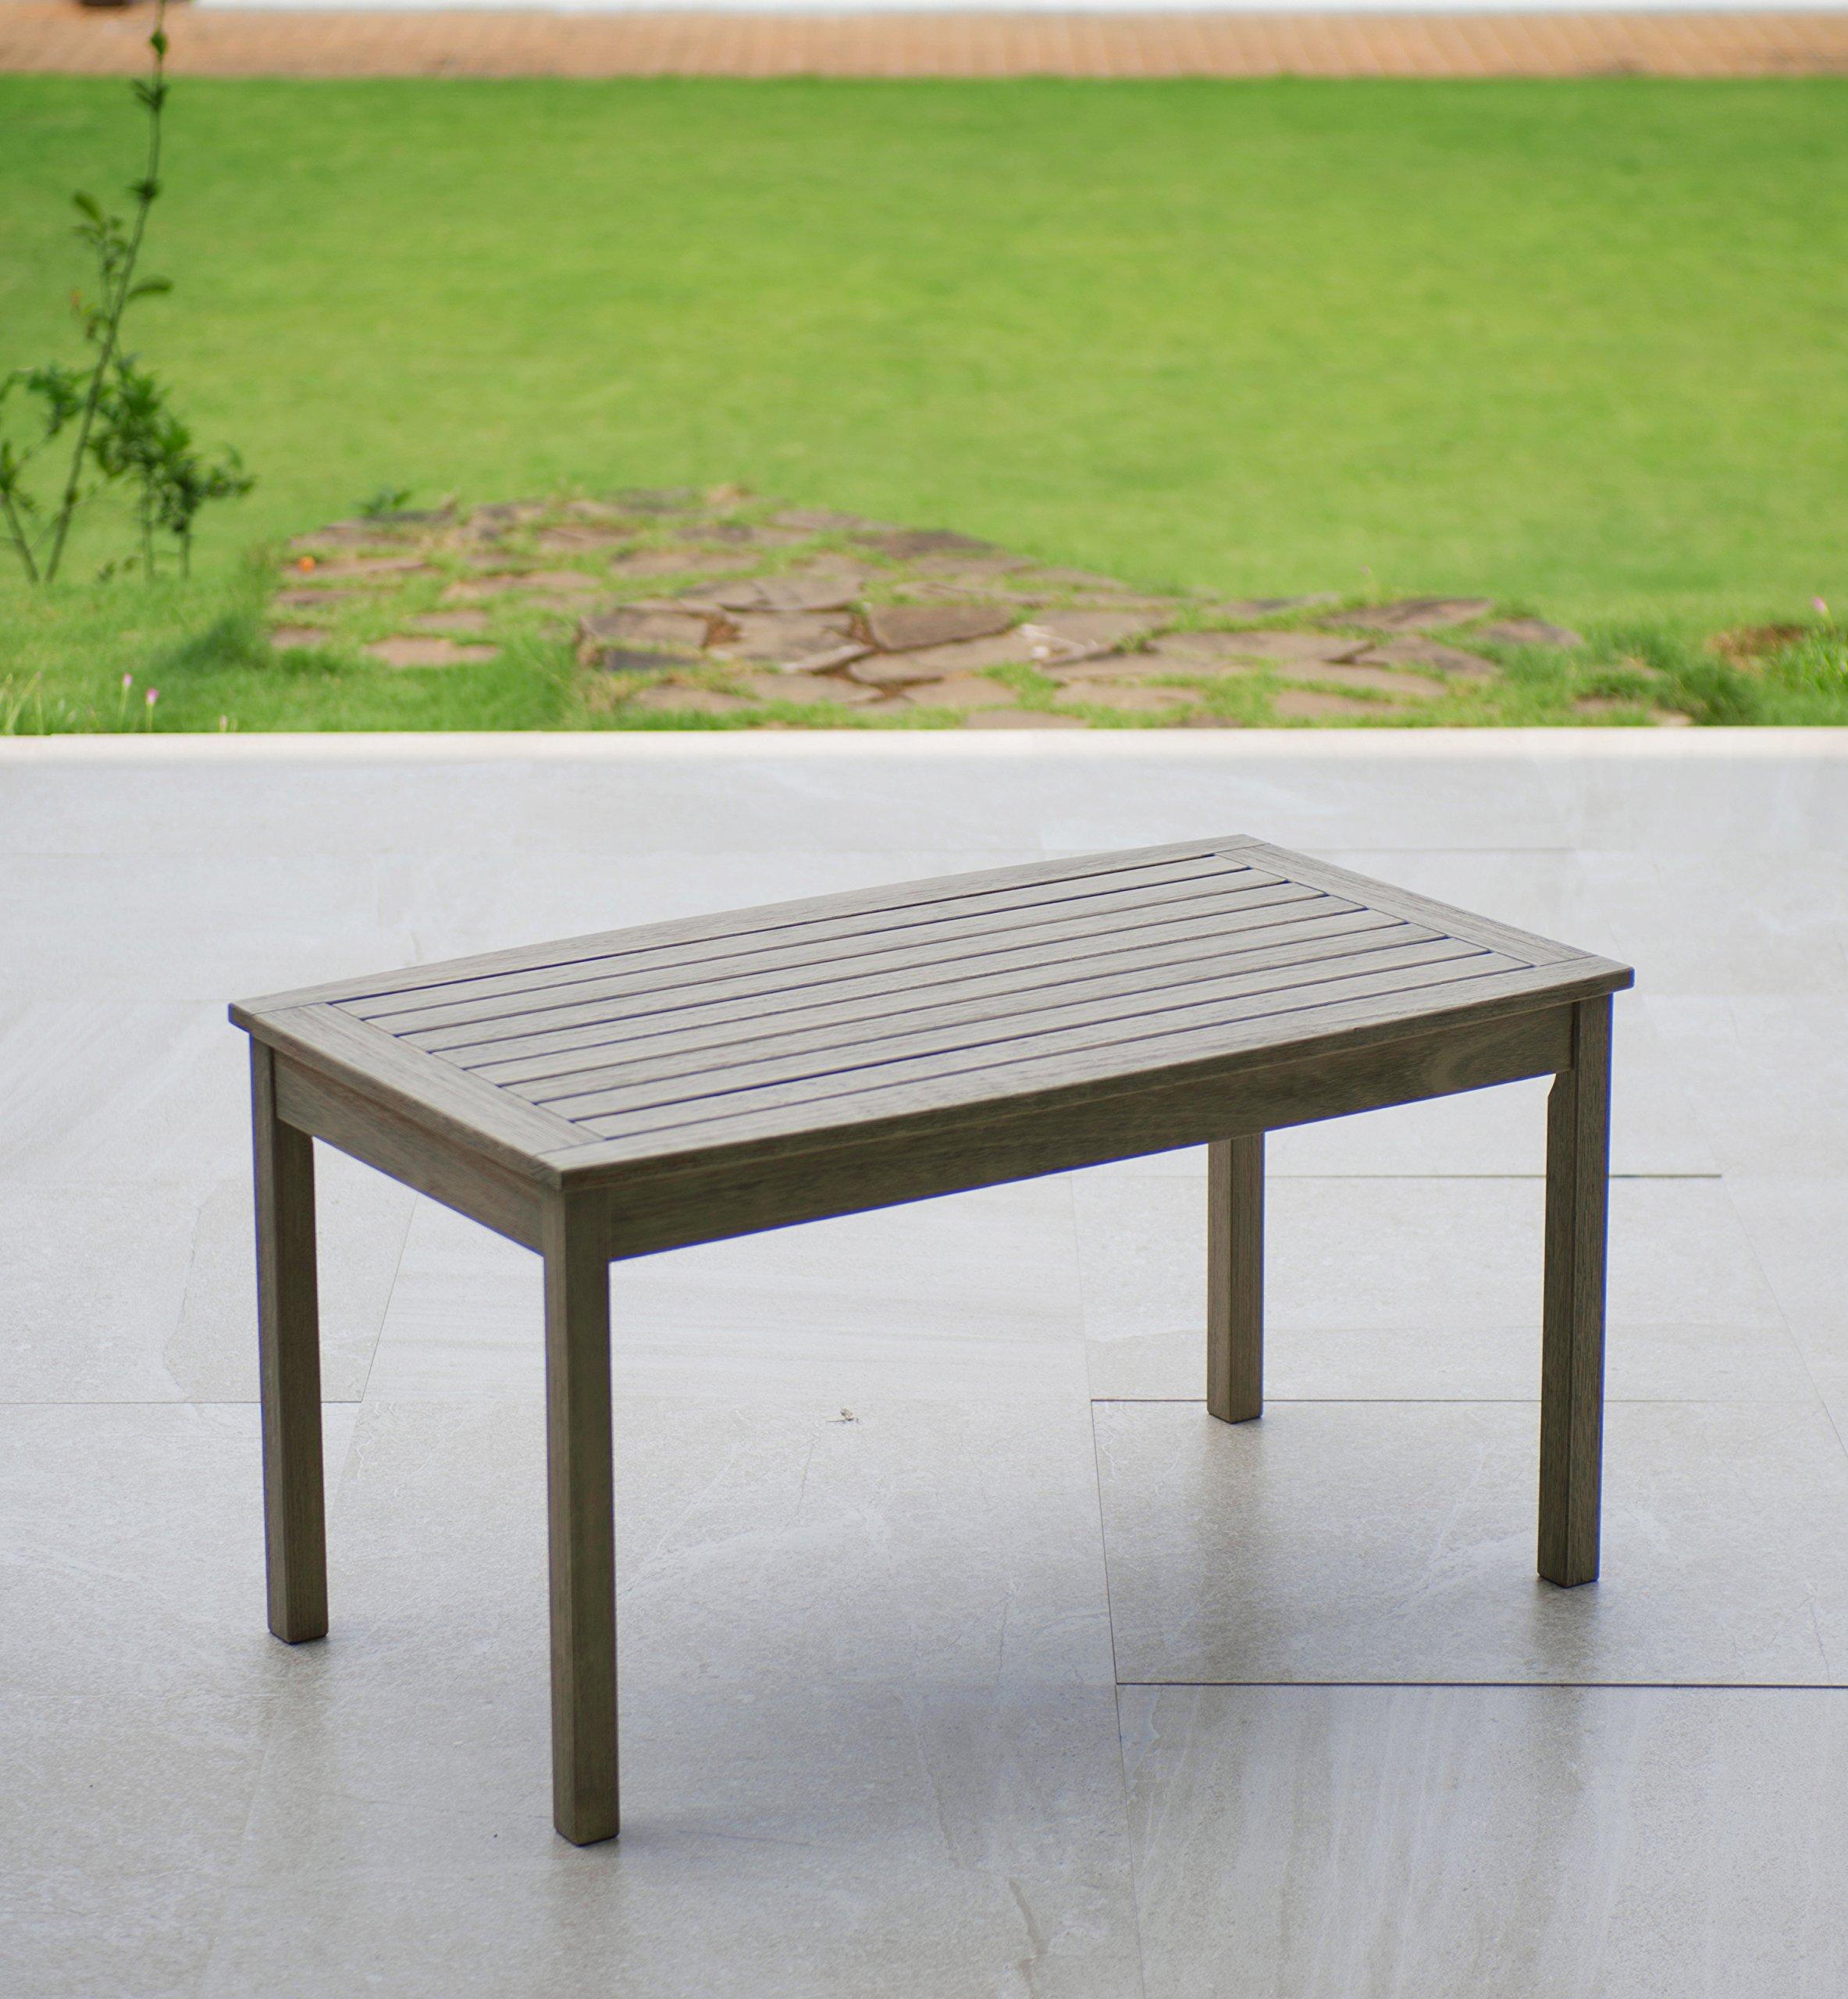 Cambridge-Casual 170267 West Lake Coffee Table, Weathered Grey